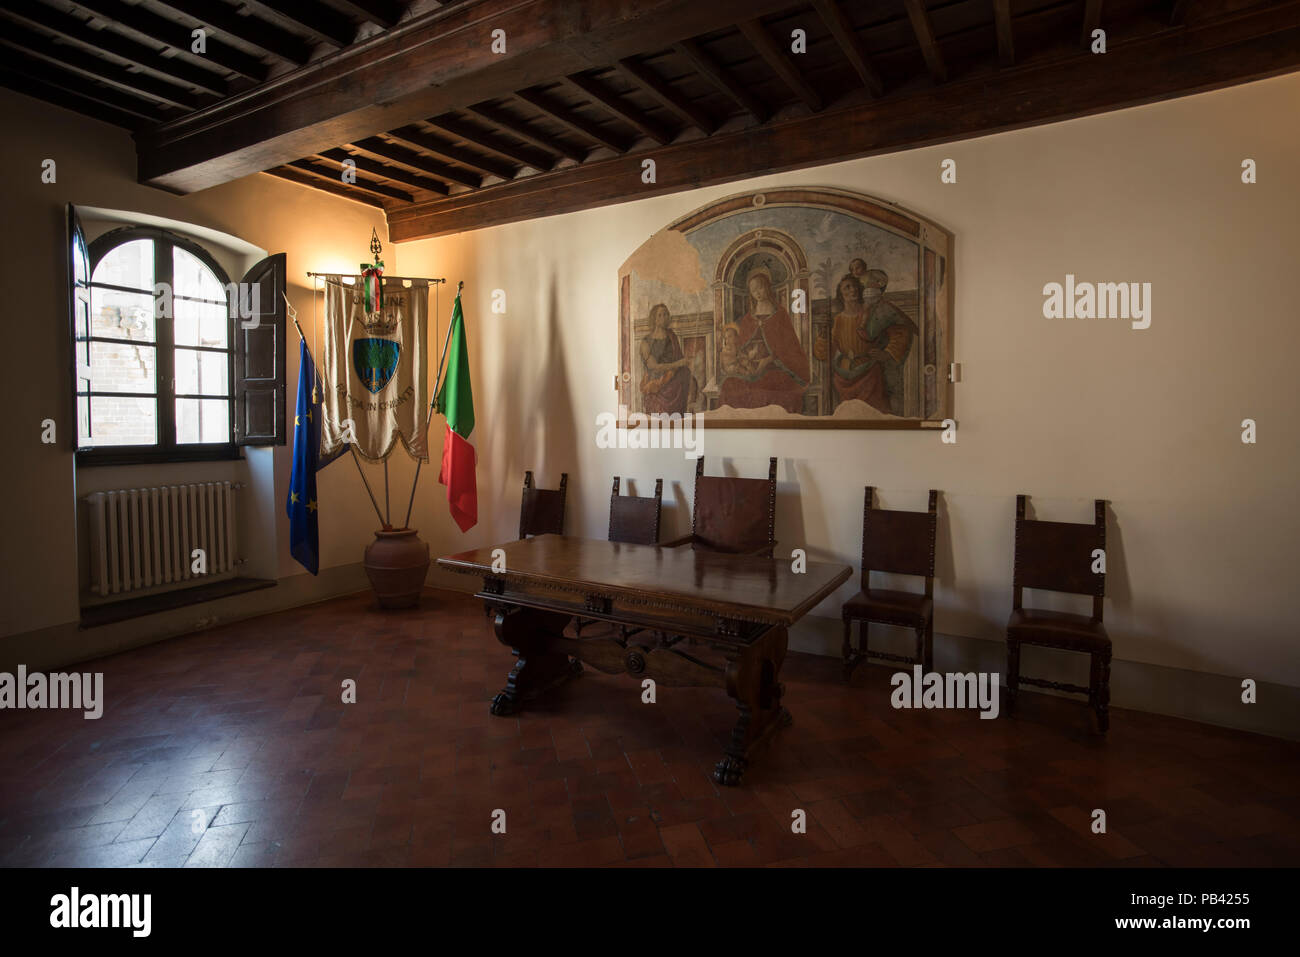 Radda in Chianti, Tuscany Italy. June 2018 Palazzo del Podestà interior showing local council chamber with Italian flags. - Stock Image